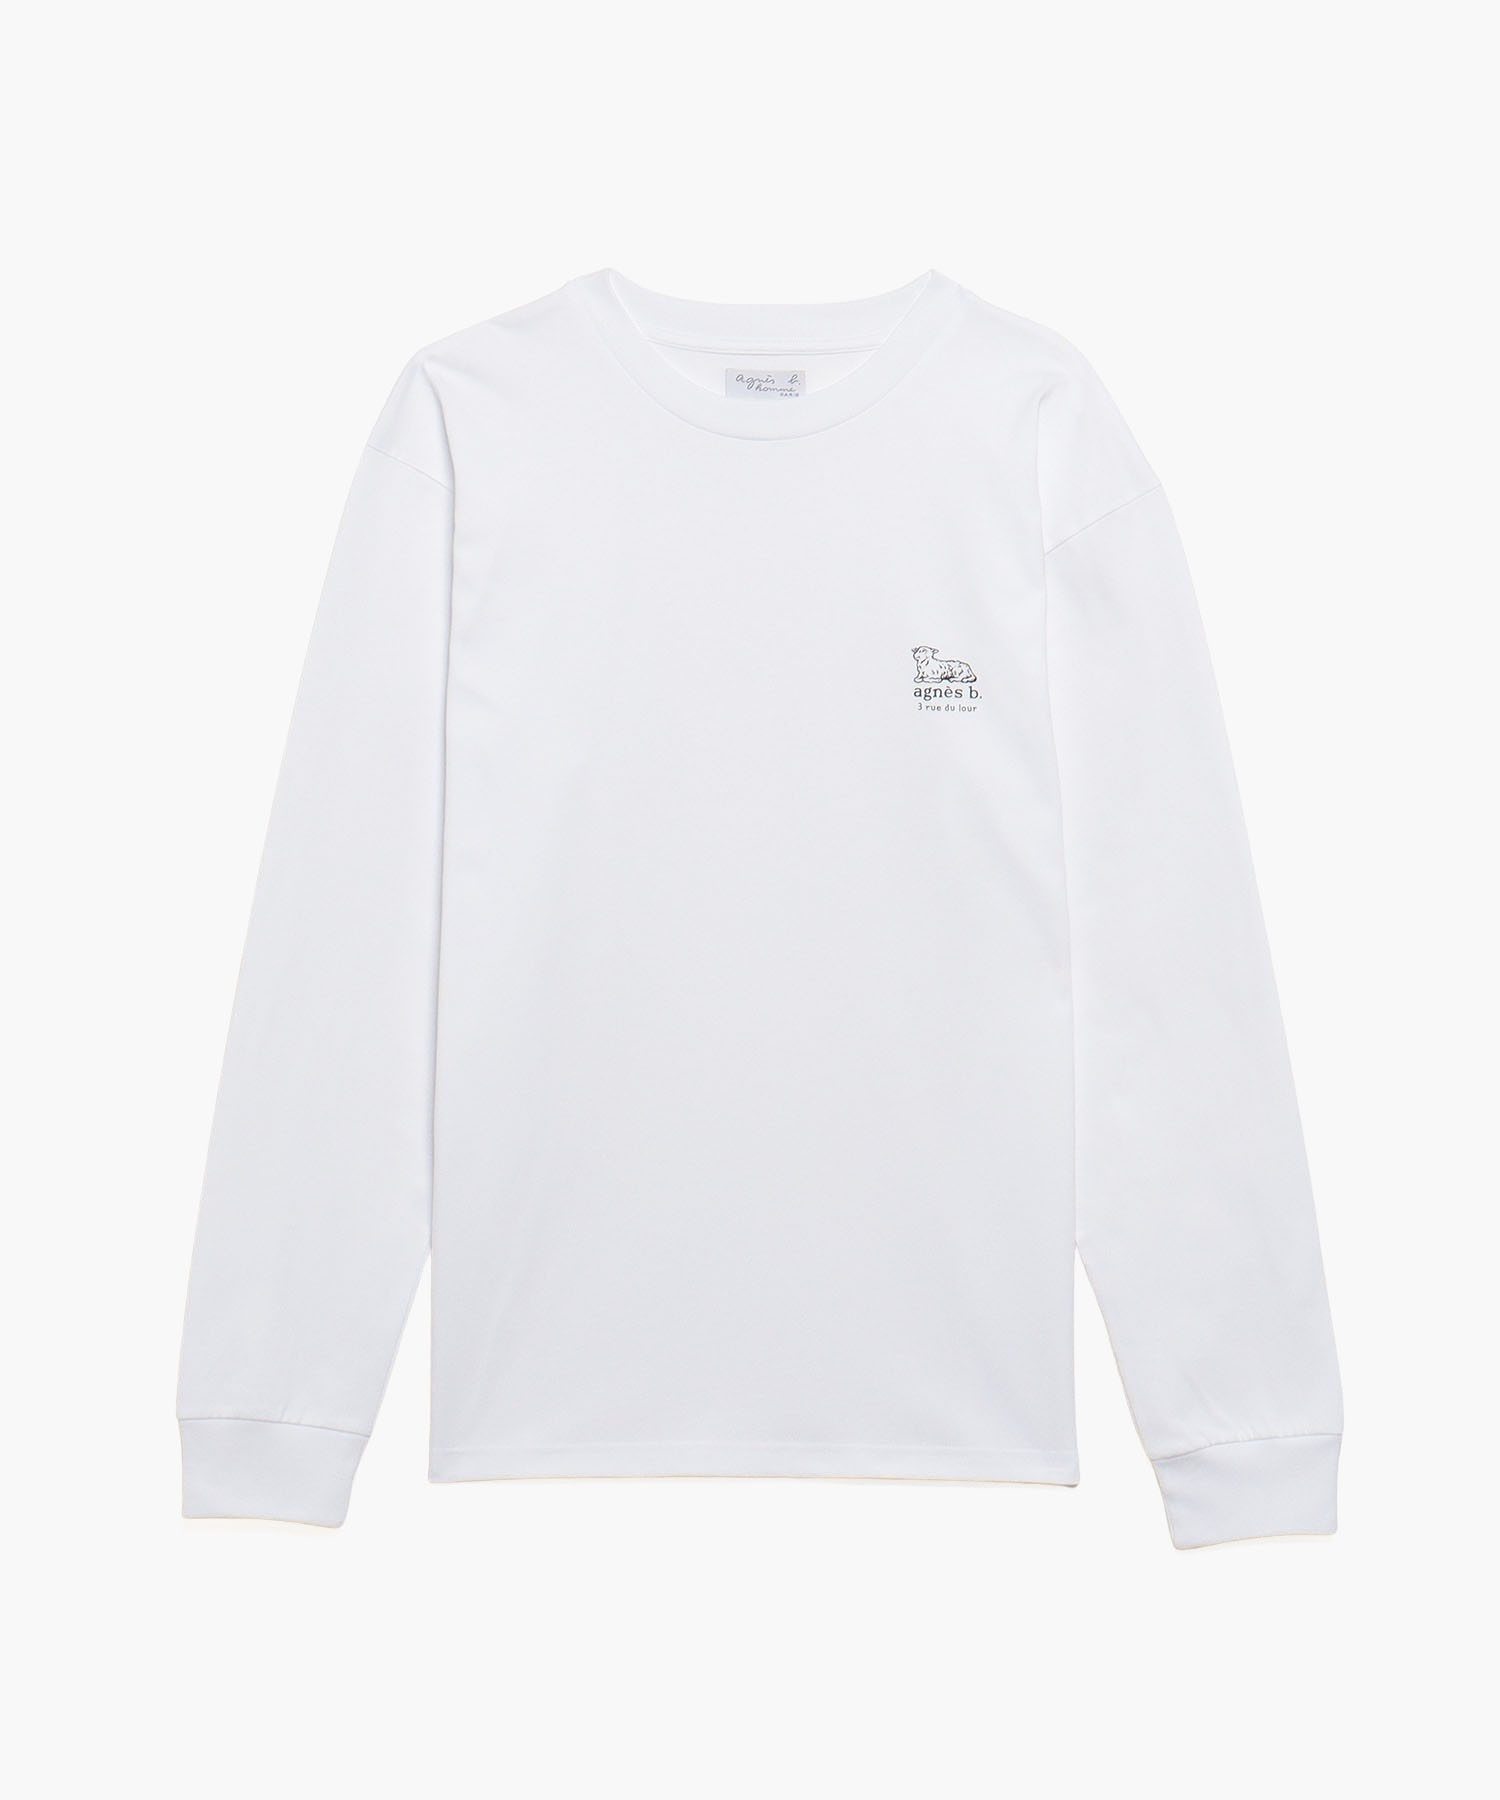 SDE8 TS クリストフ ロングTシャツ